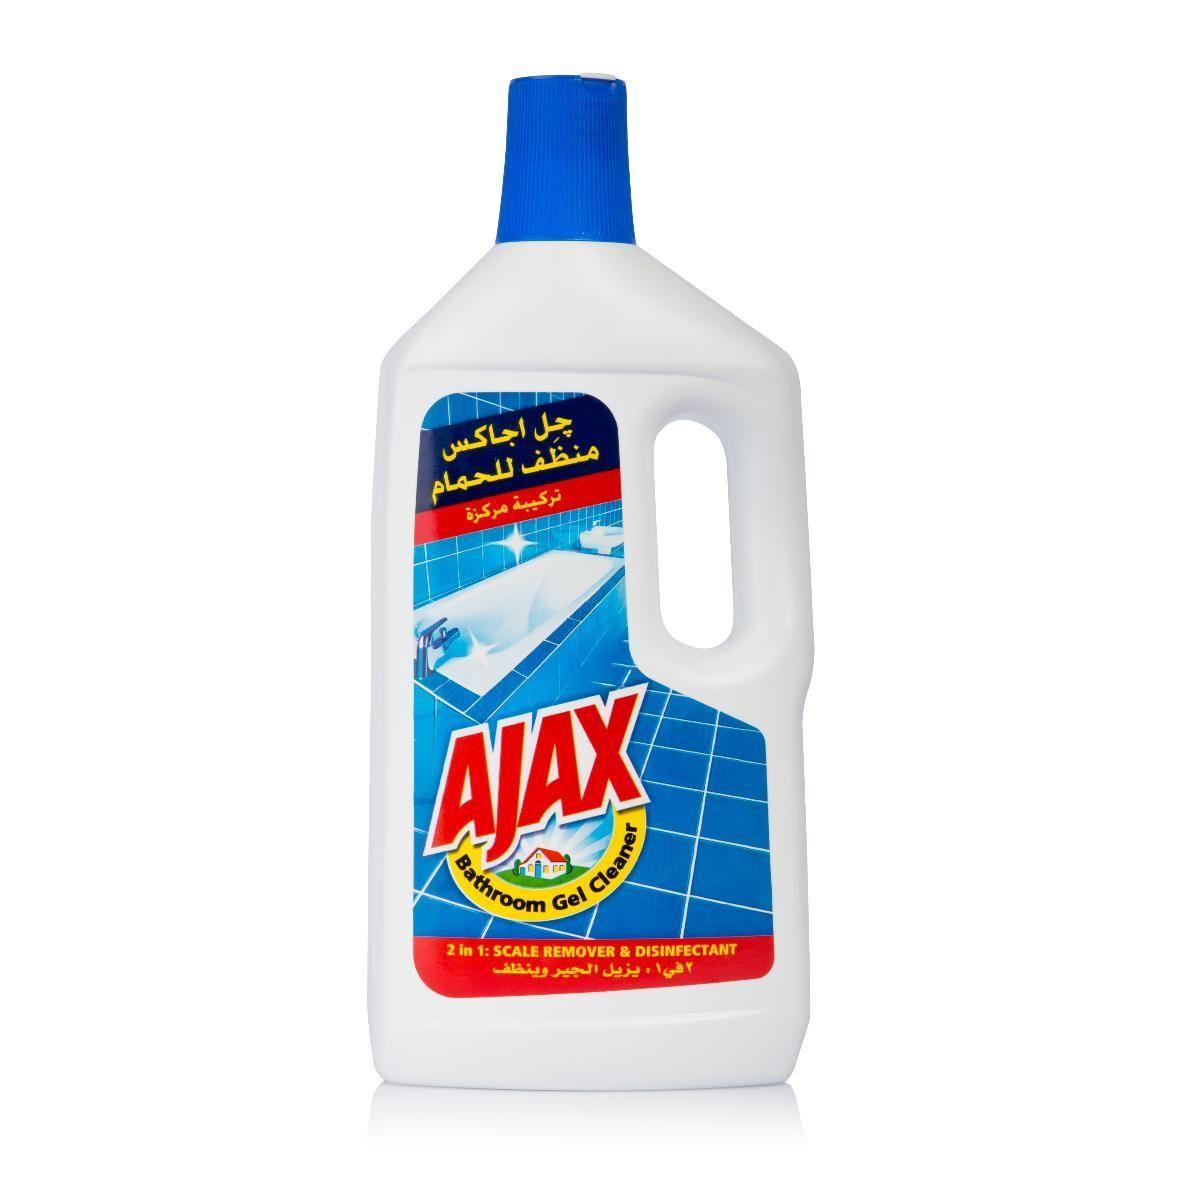 Ajax Bath Gel Cleaner 1 Litre